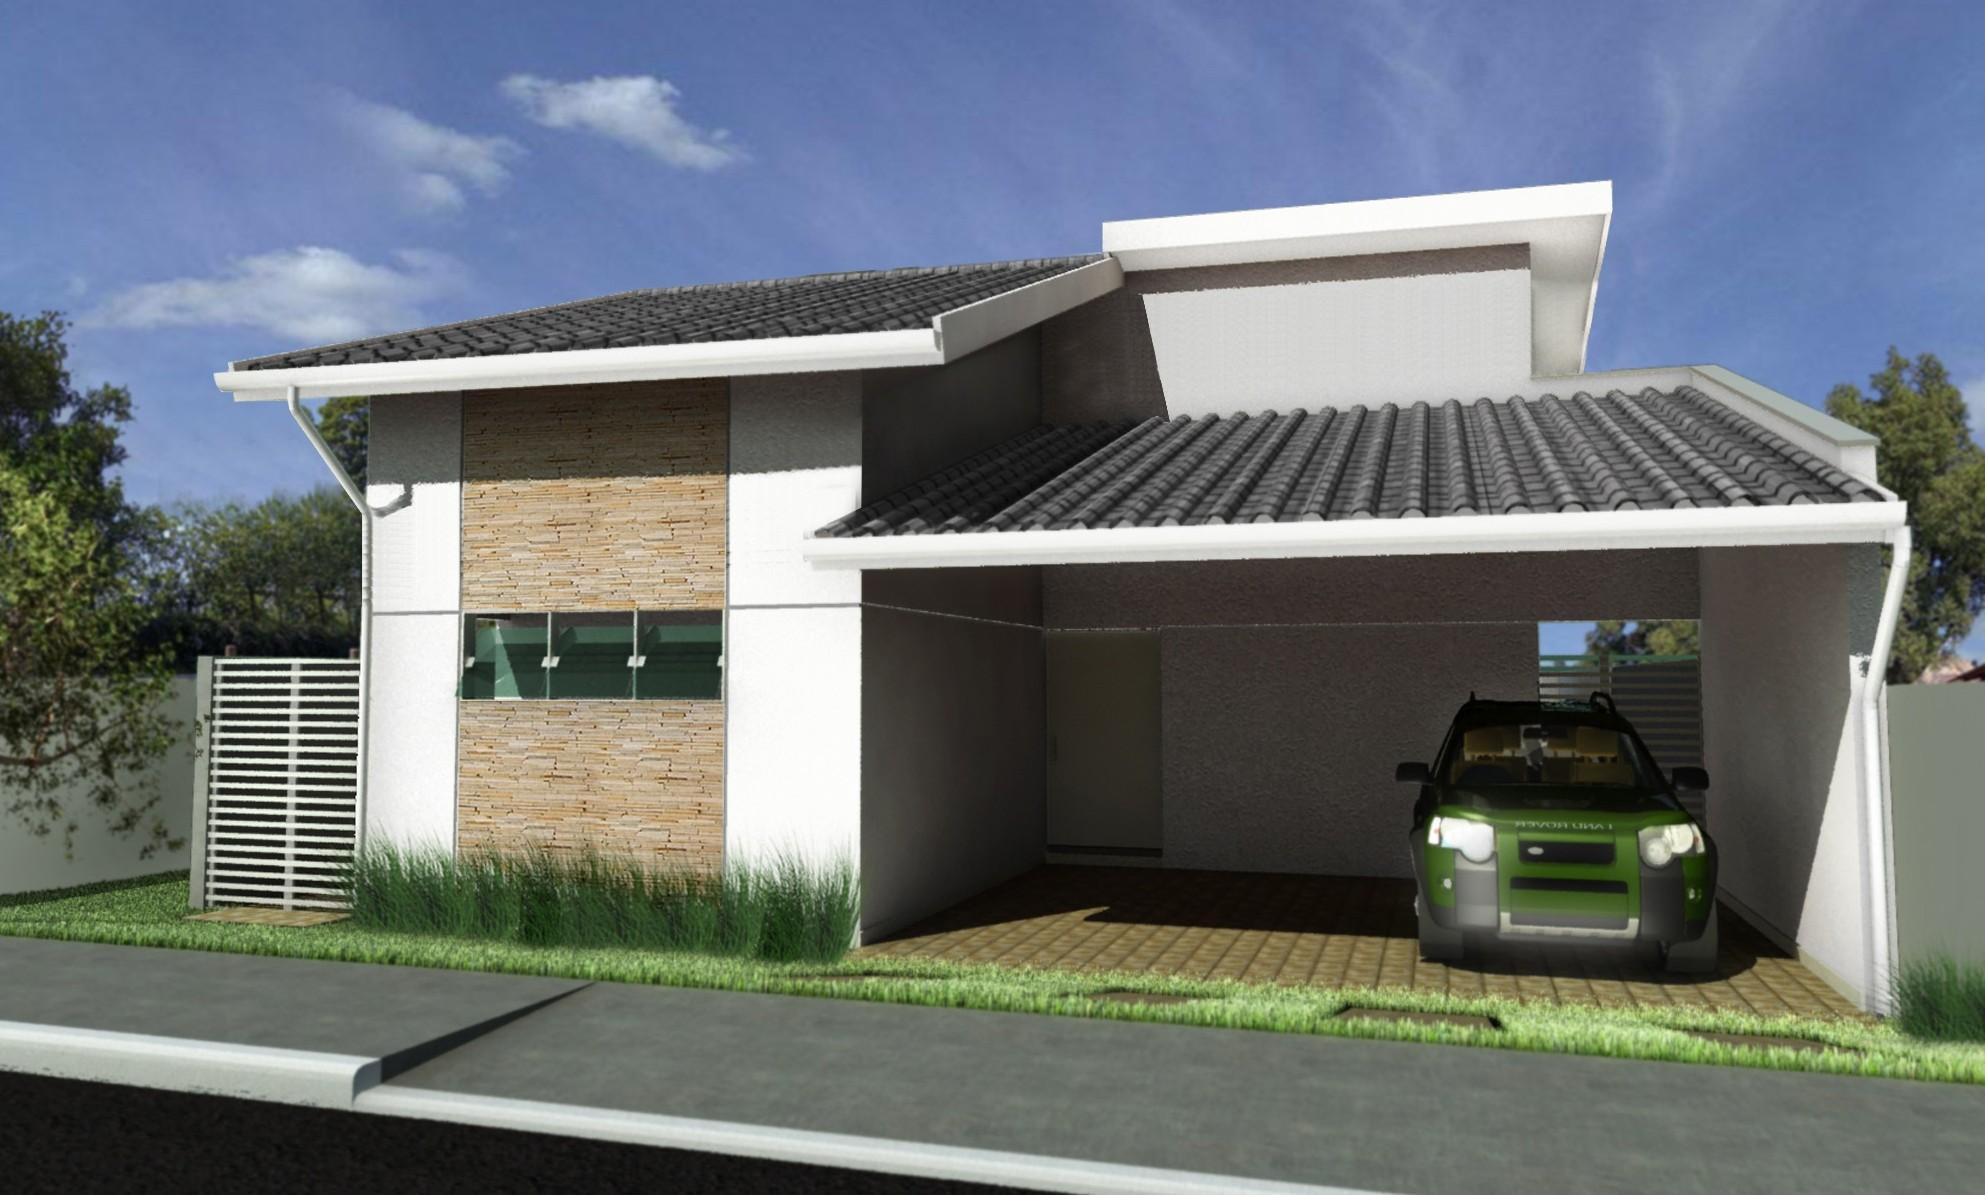 Fotos de fachadas de casas simples pequenas e baratas for Casas minimalistas baratas